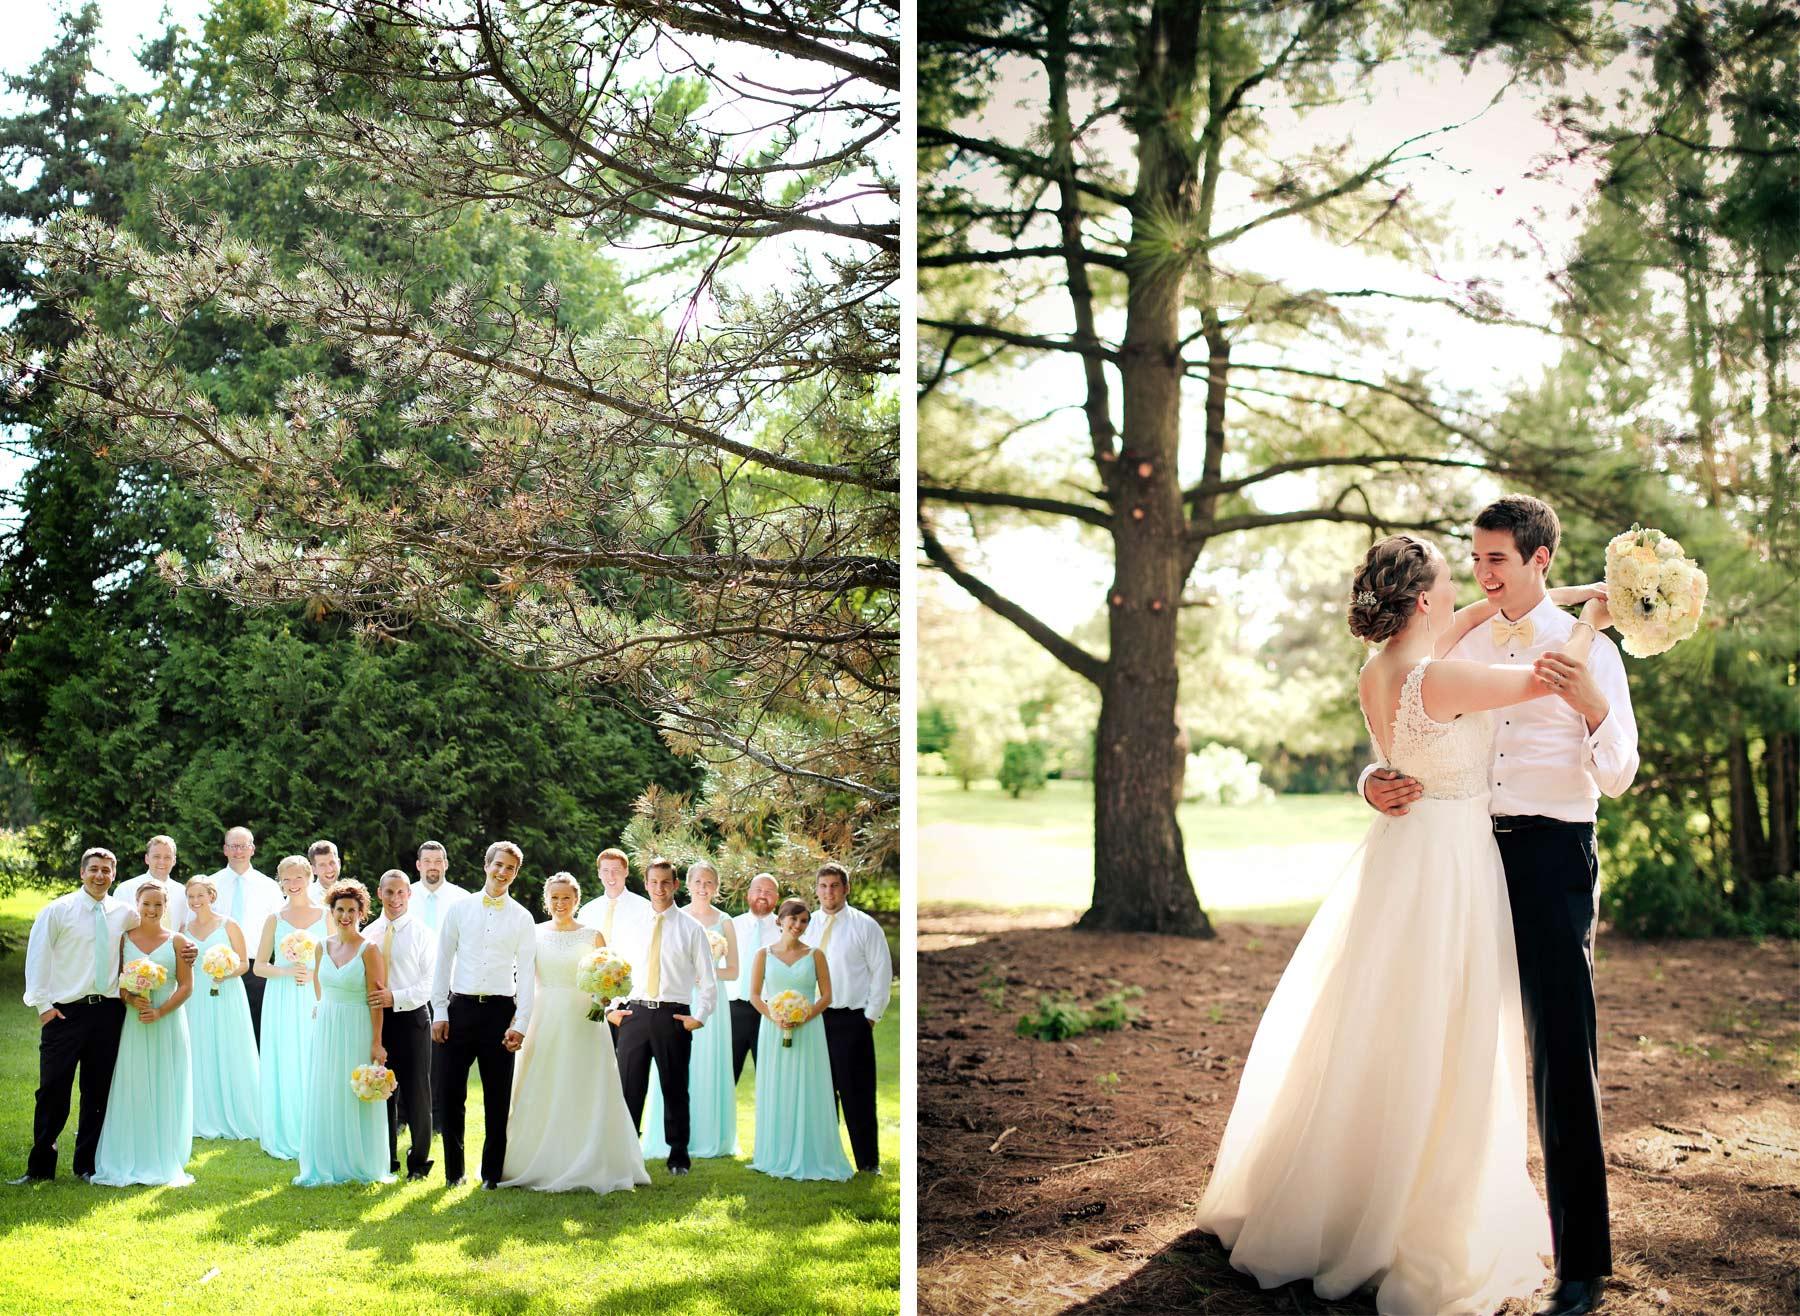 13-Minneapolis-Minnesota-Wedding-Photography-by-Vick-Photography-Edina-Wedding-Party-Grace-&-Nick.jpg